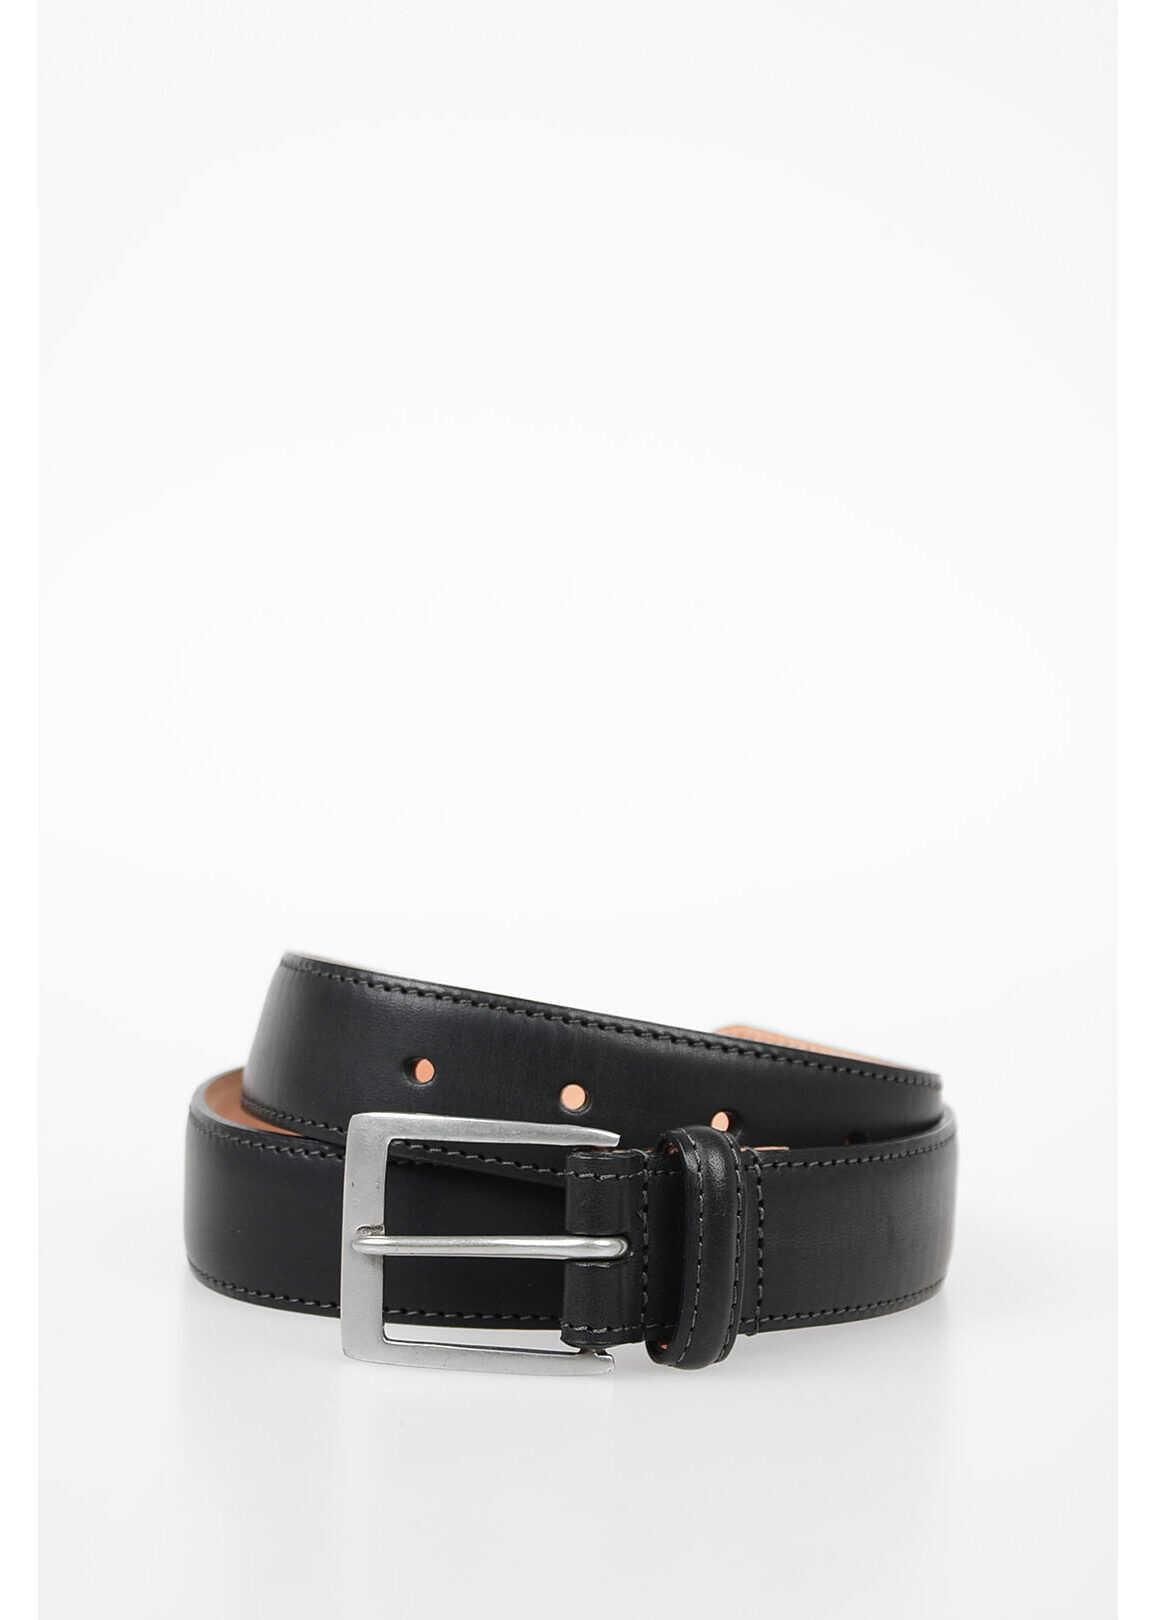 Paul Smith 30mm Leather Belt BLACK